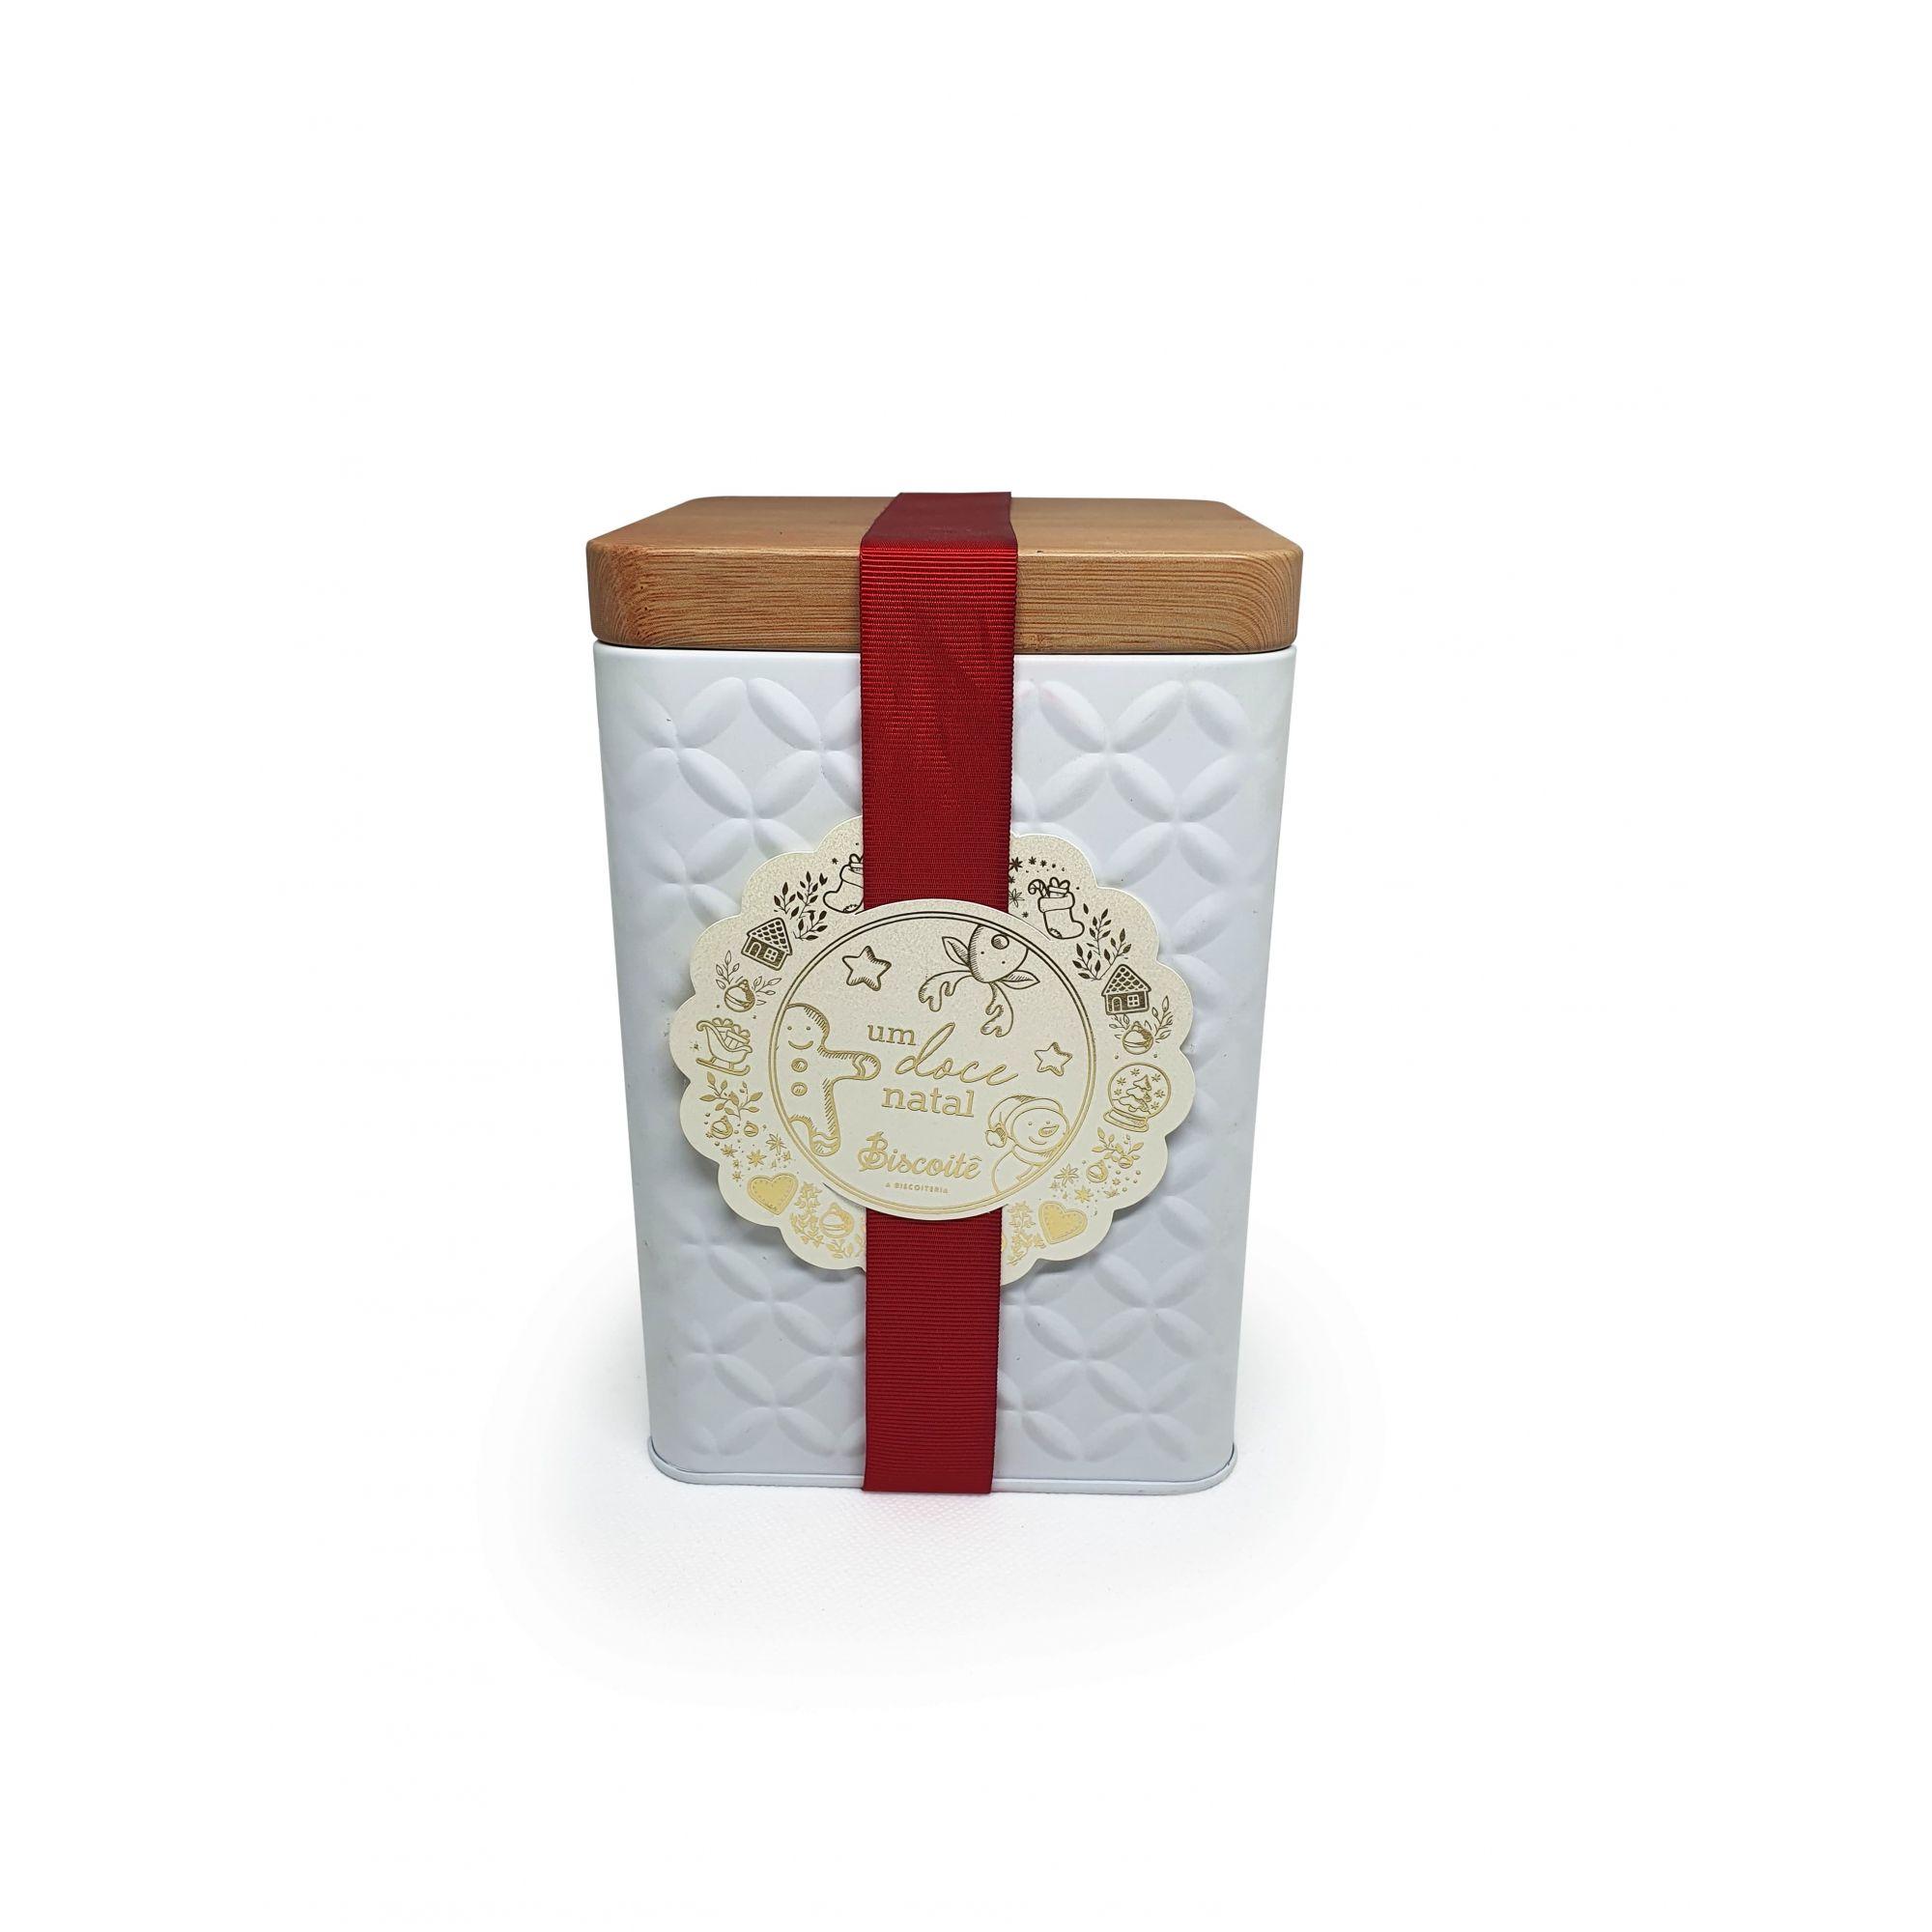 Cremiê - Lata Branca Quadrada - 250g